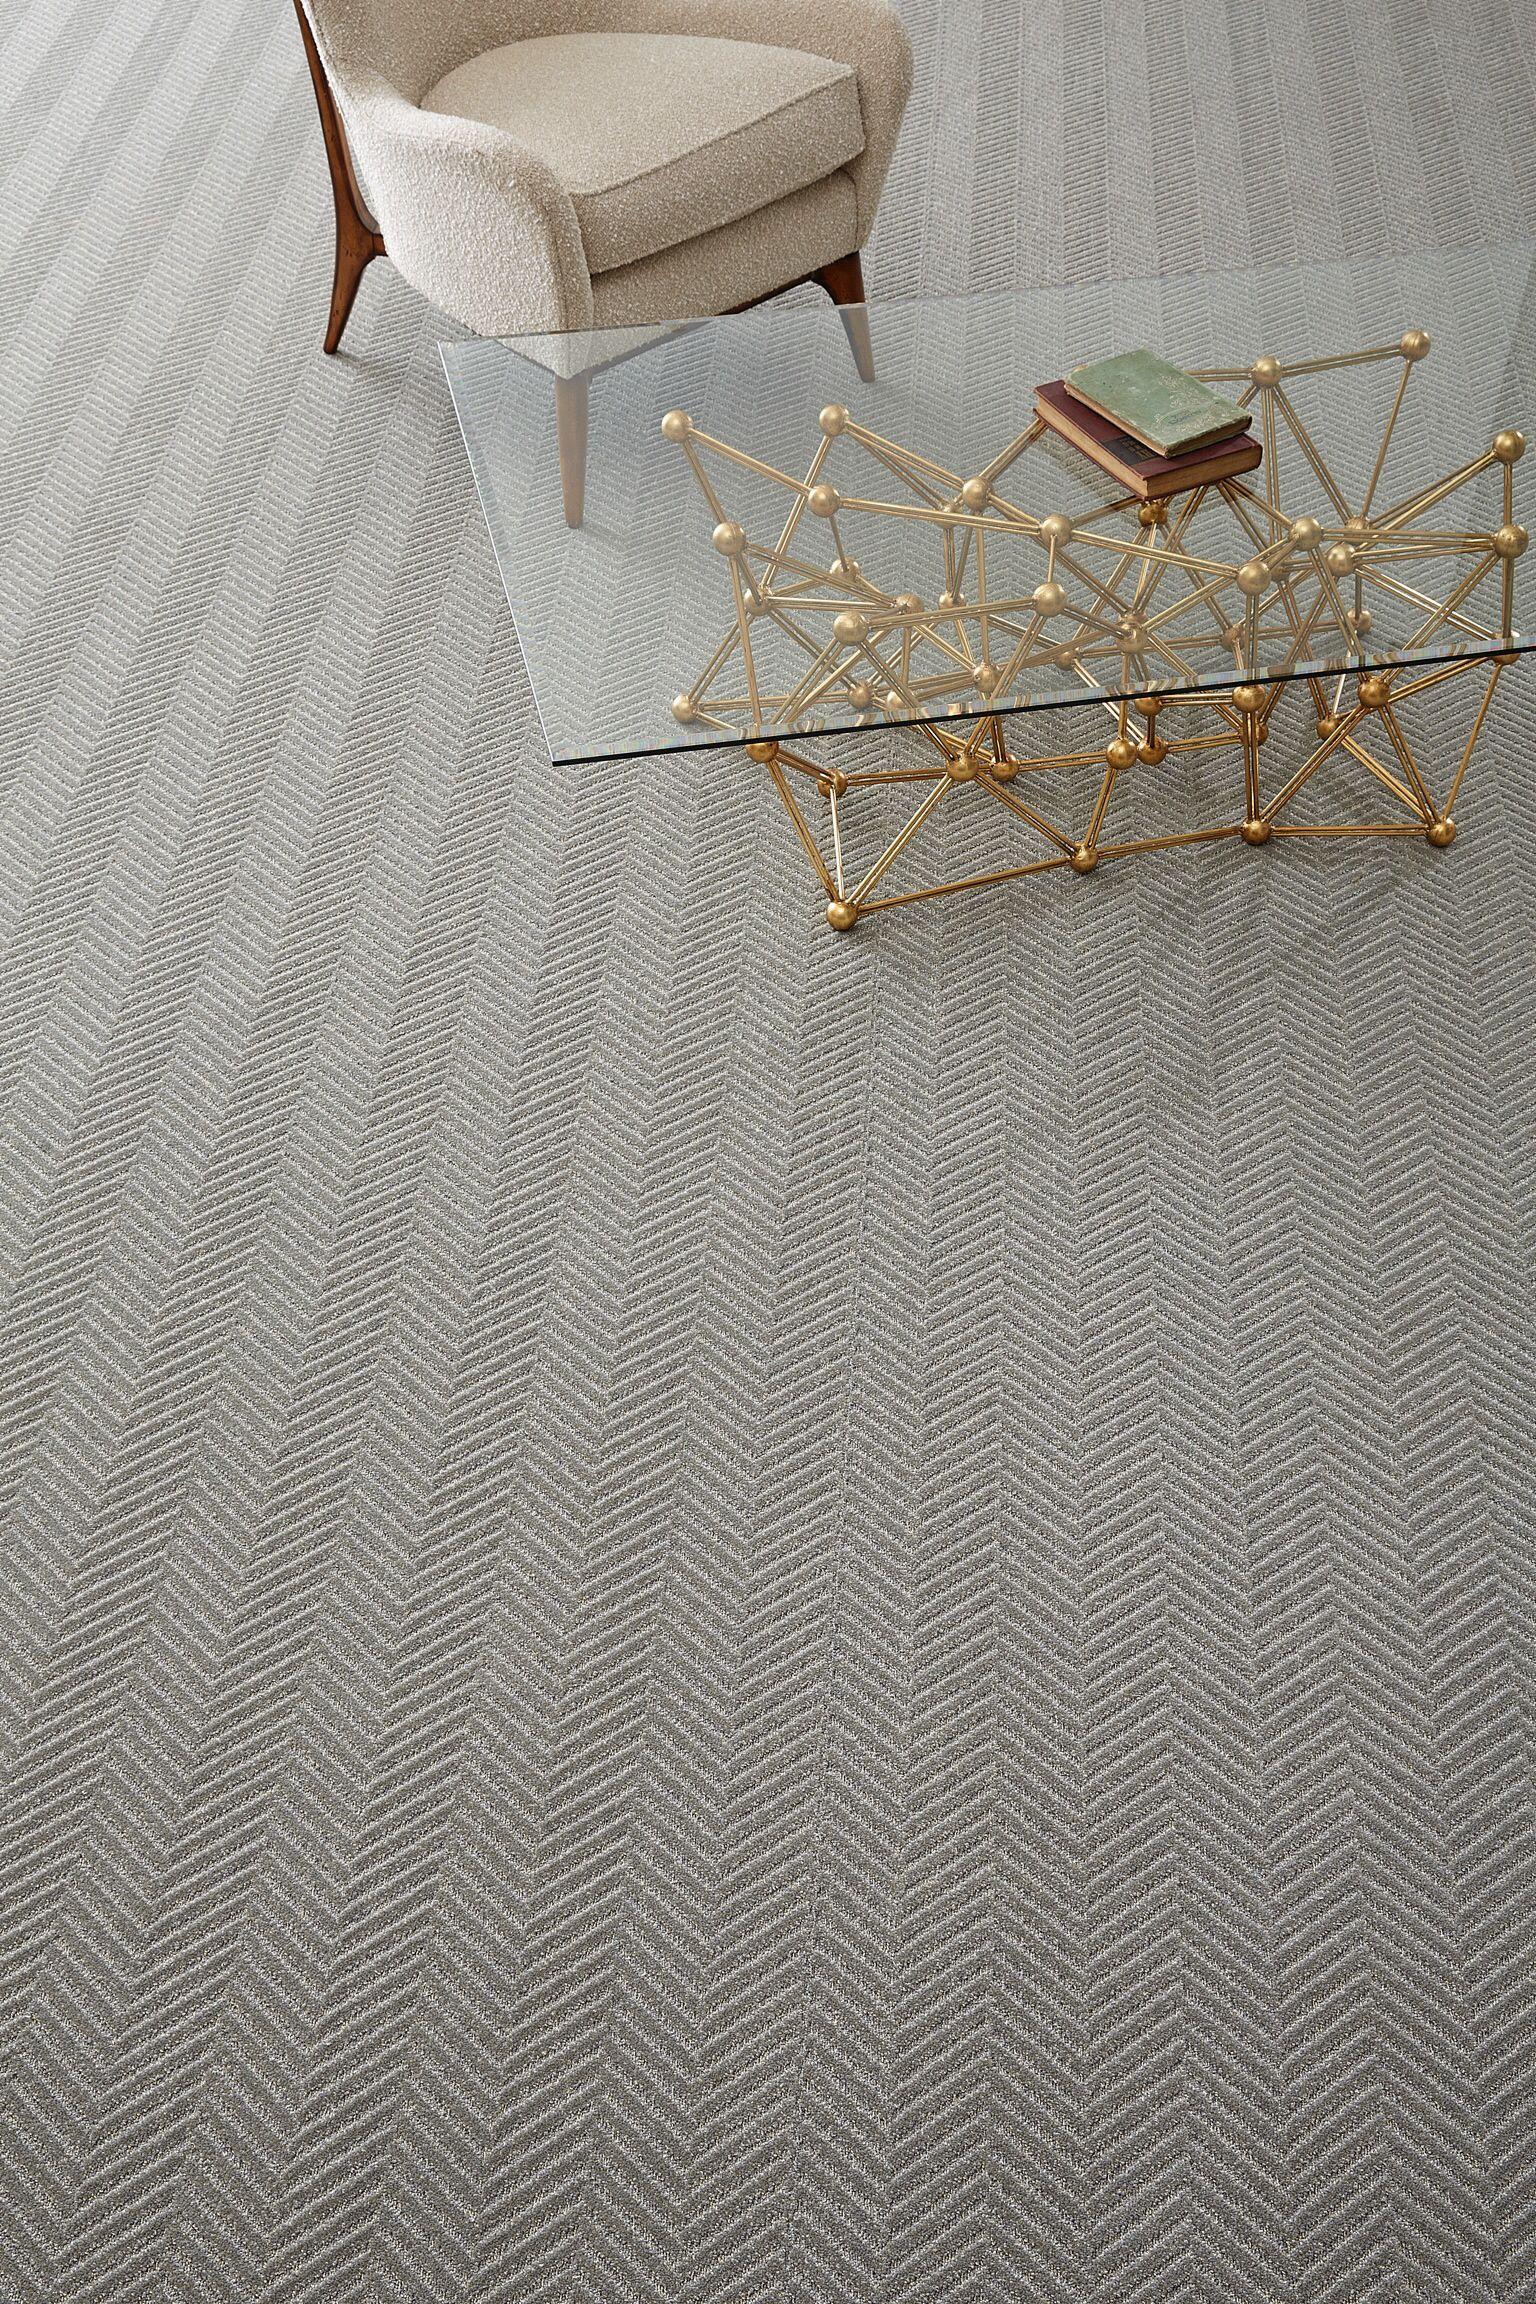 Hallway stair carpet ideas  Timeless large scale herringbone carpet totallycarpet  Guildford